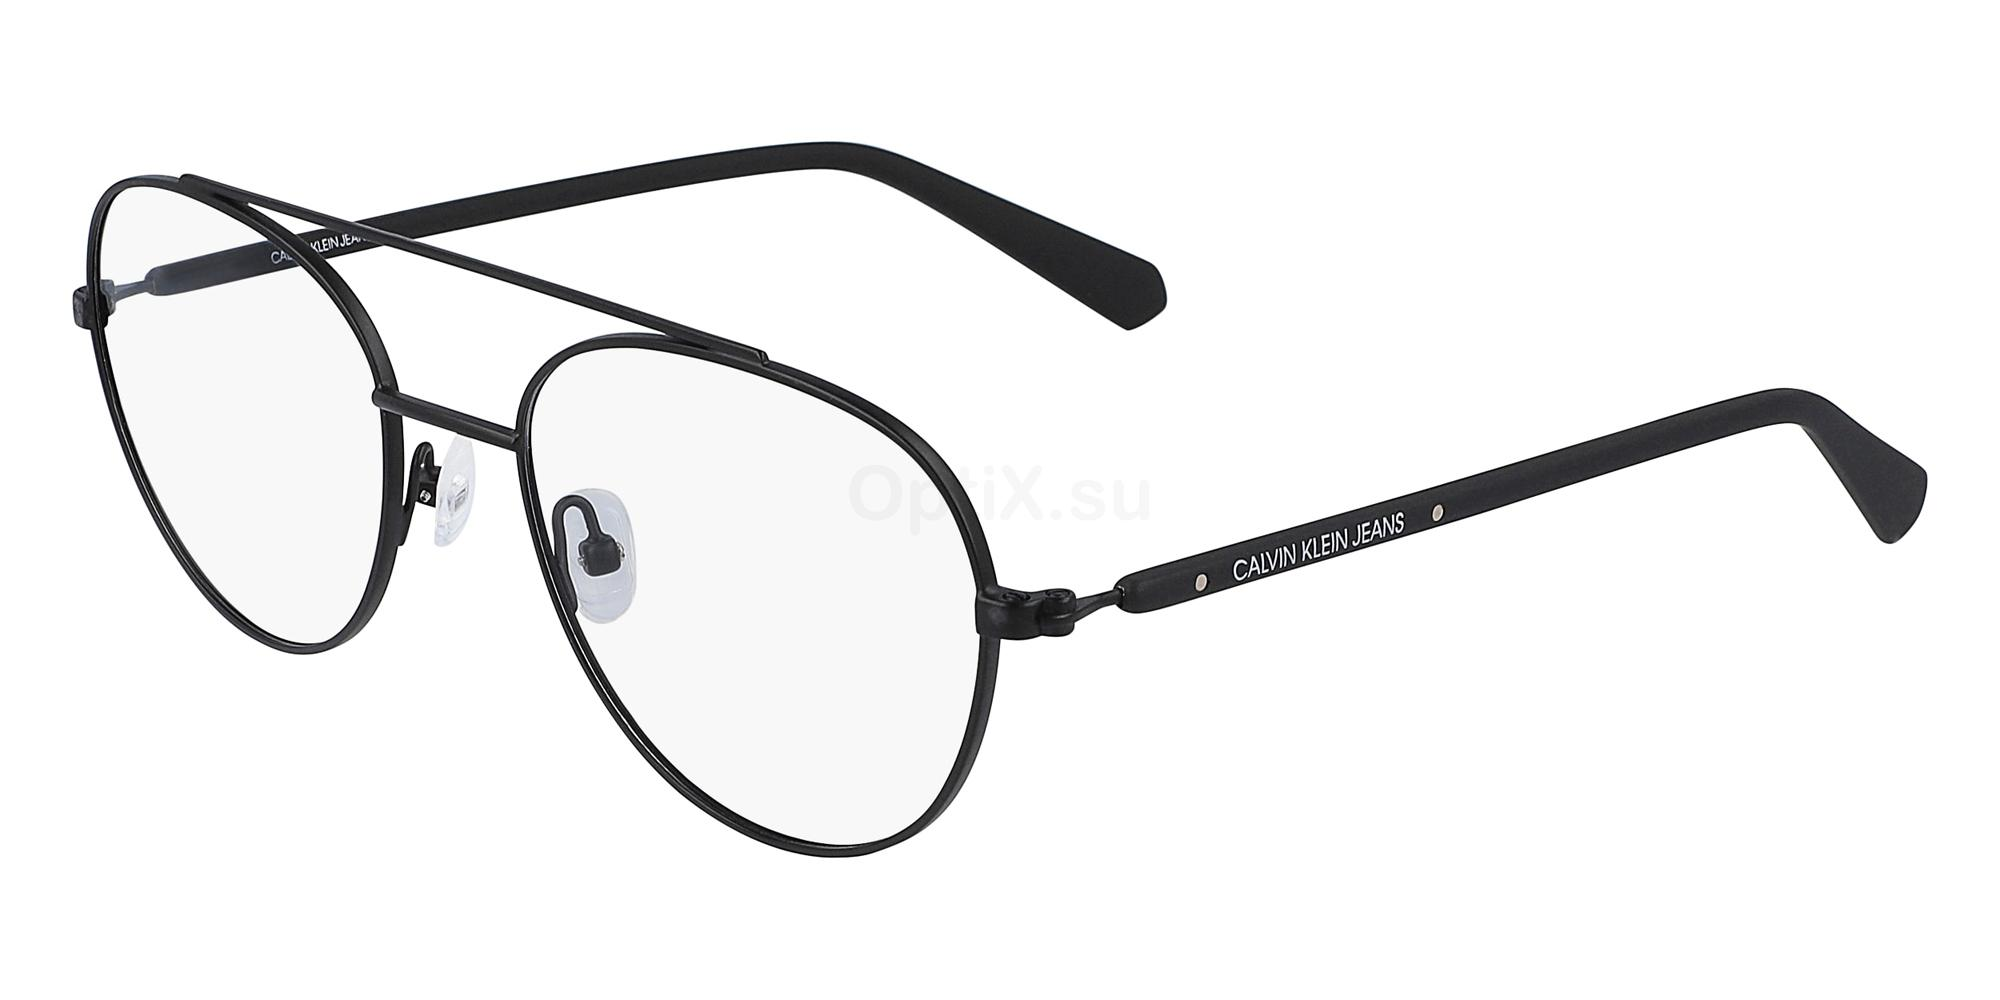 001 CKJ20304 Glasses, Calvin Klein Jeans